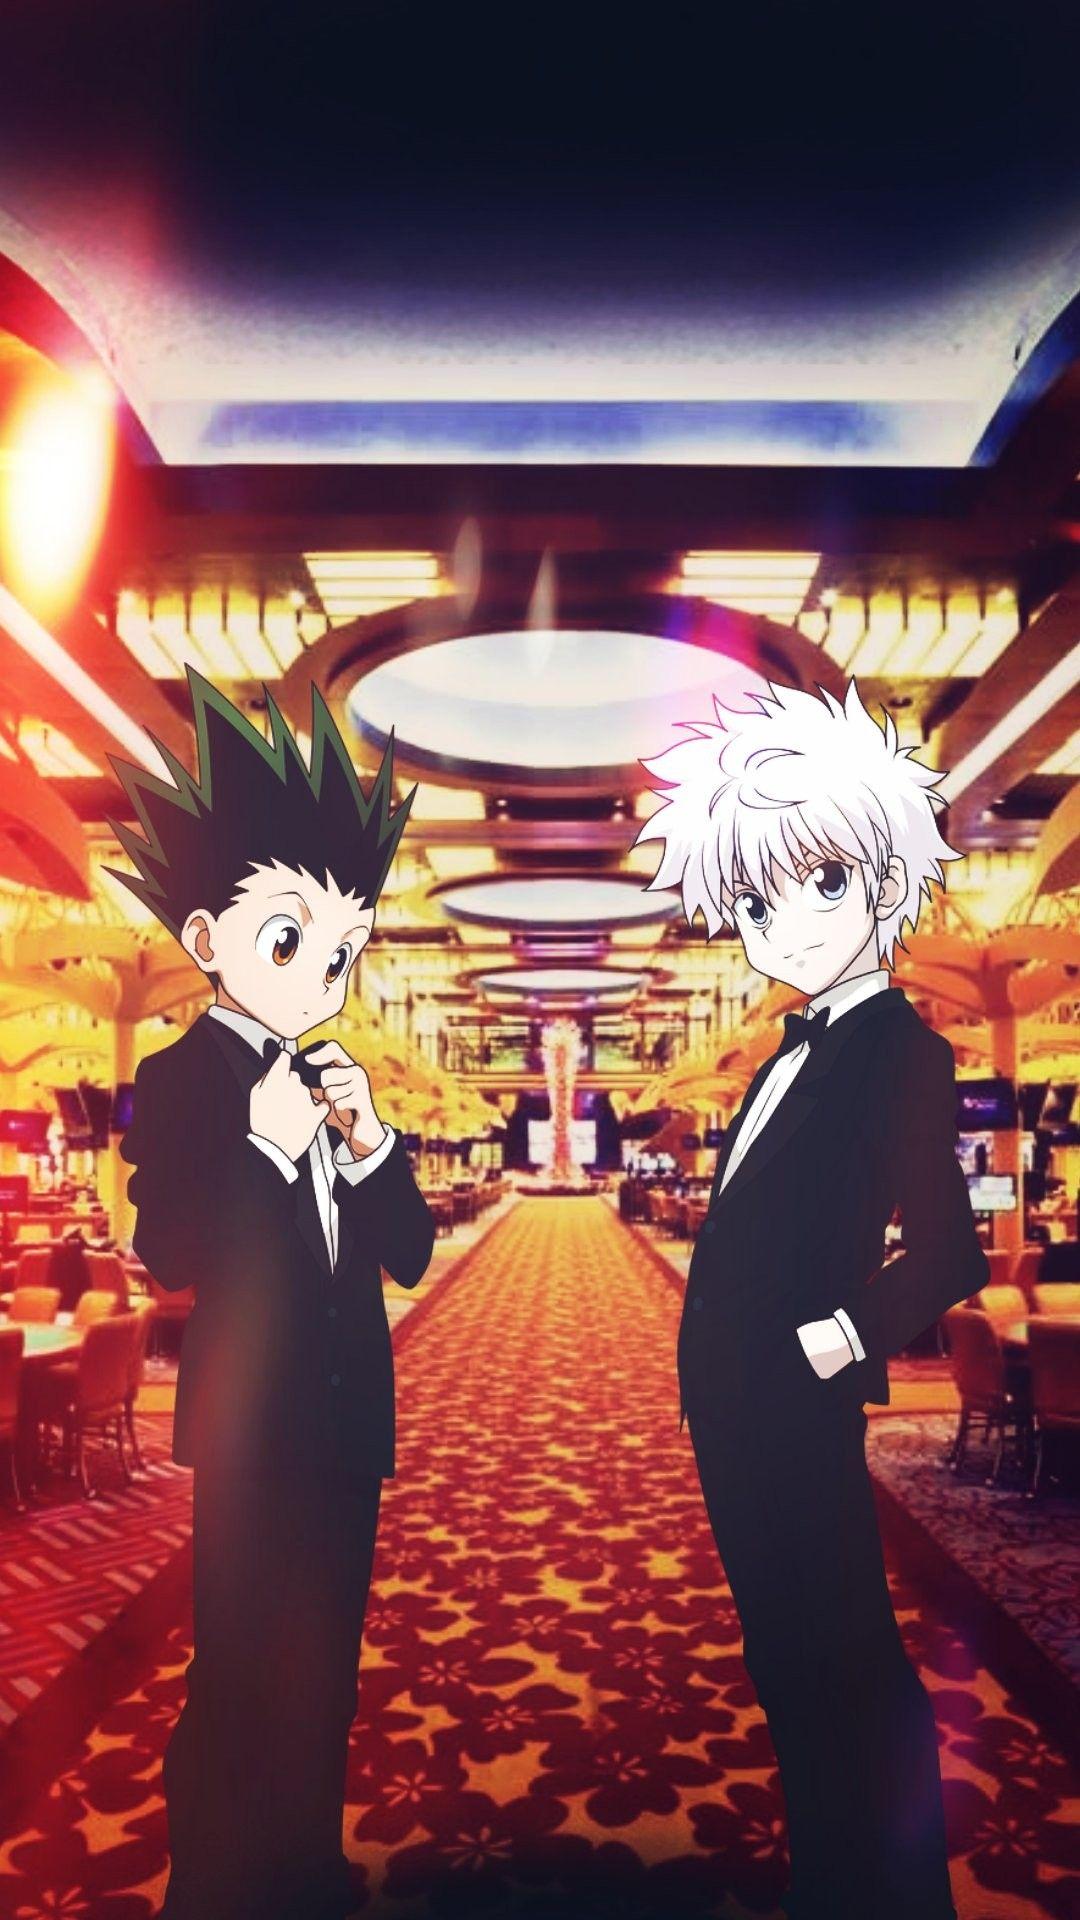 ɢᴏɴ X Á´‹ÉªÊŸÊŸá´œá´€ Fond D Ecran Telephone Kirua Dessin Manga